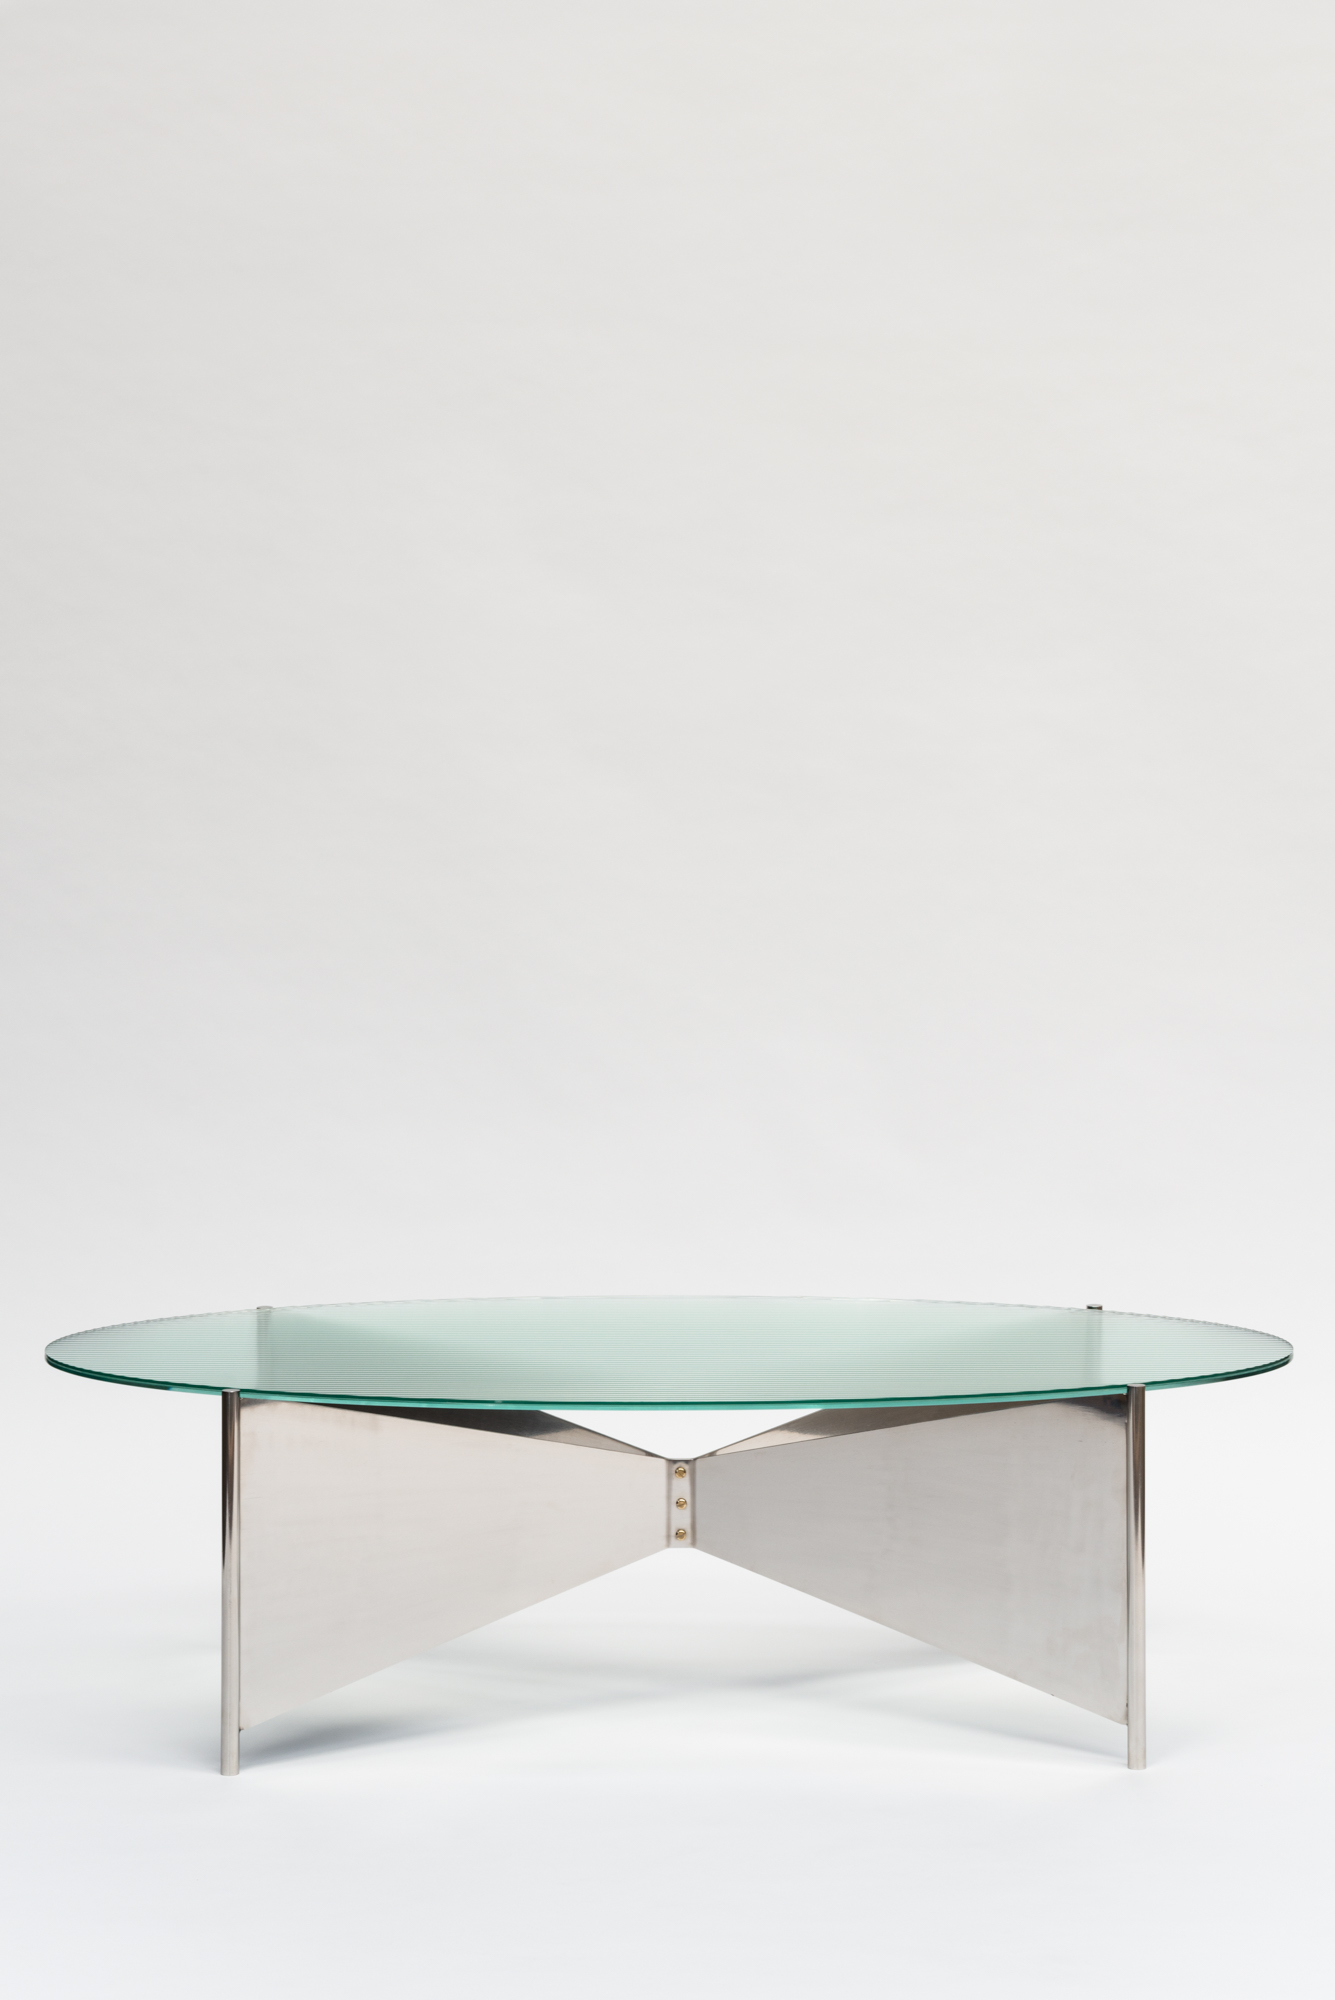 bermondsey coffee table -